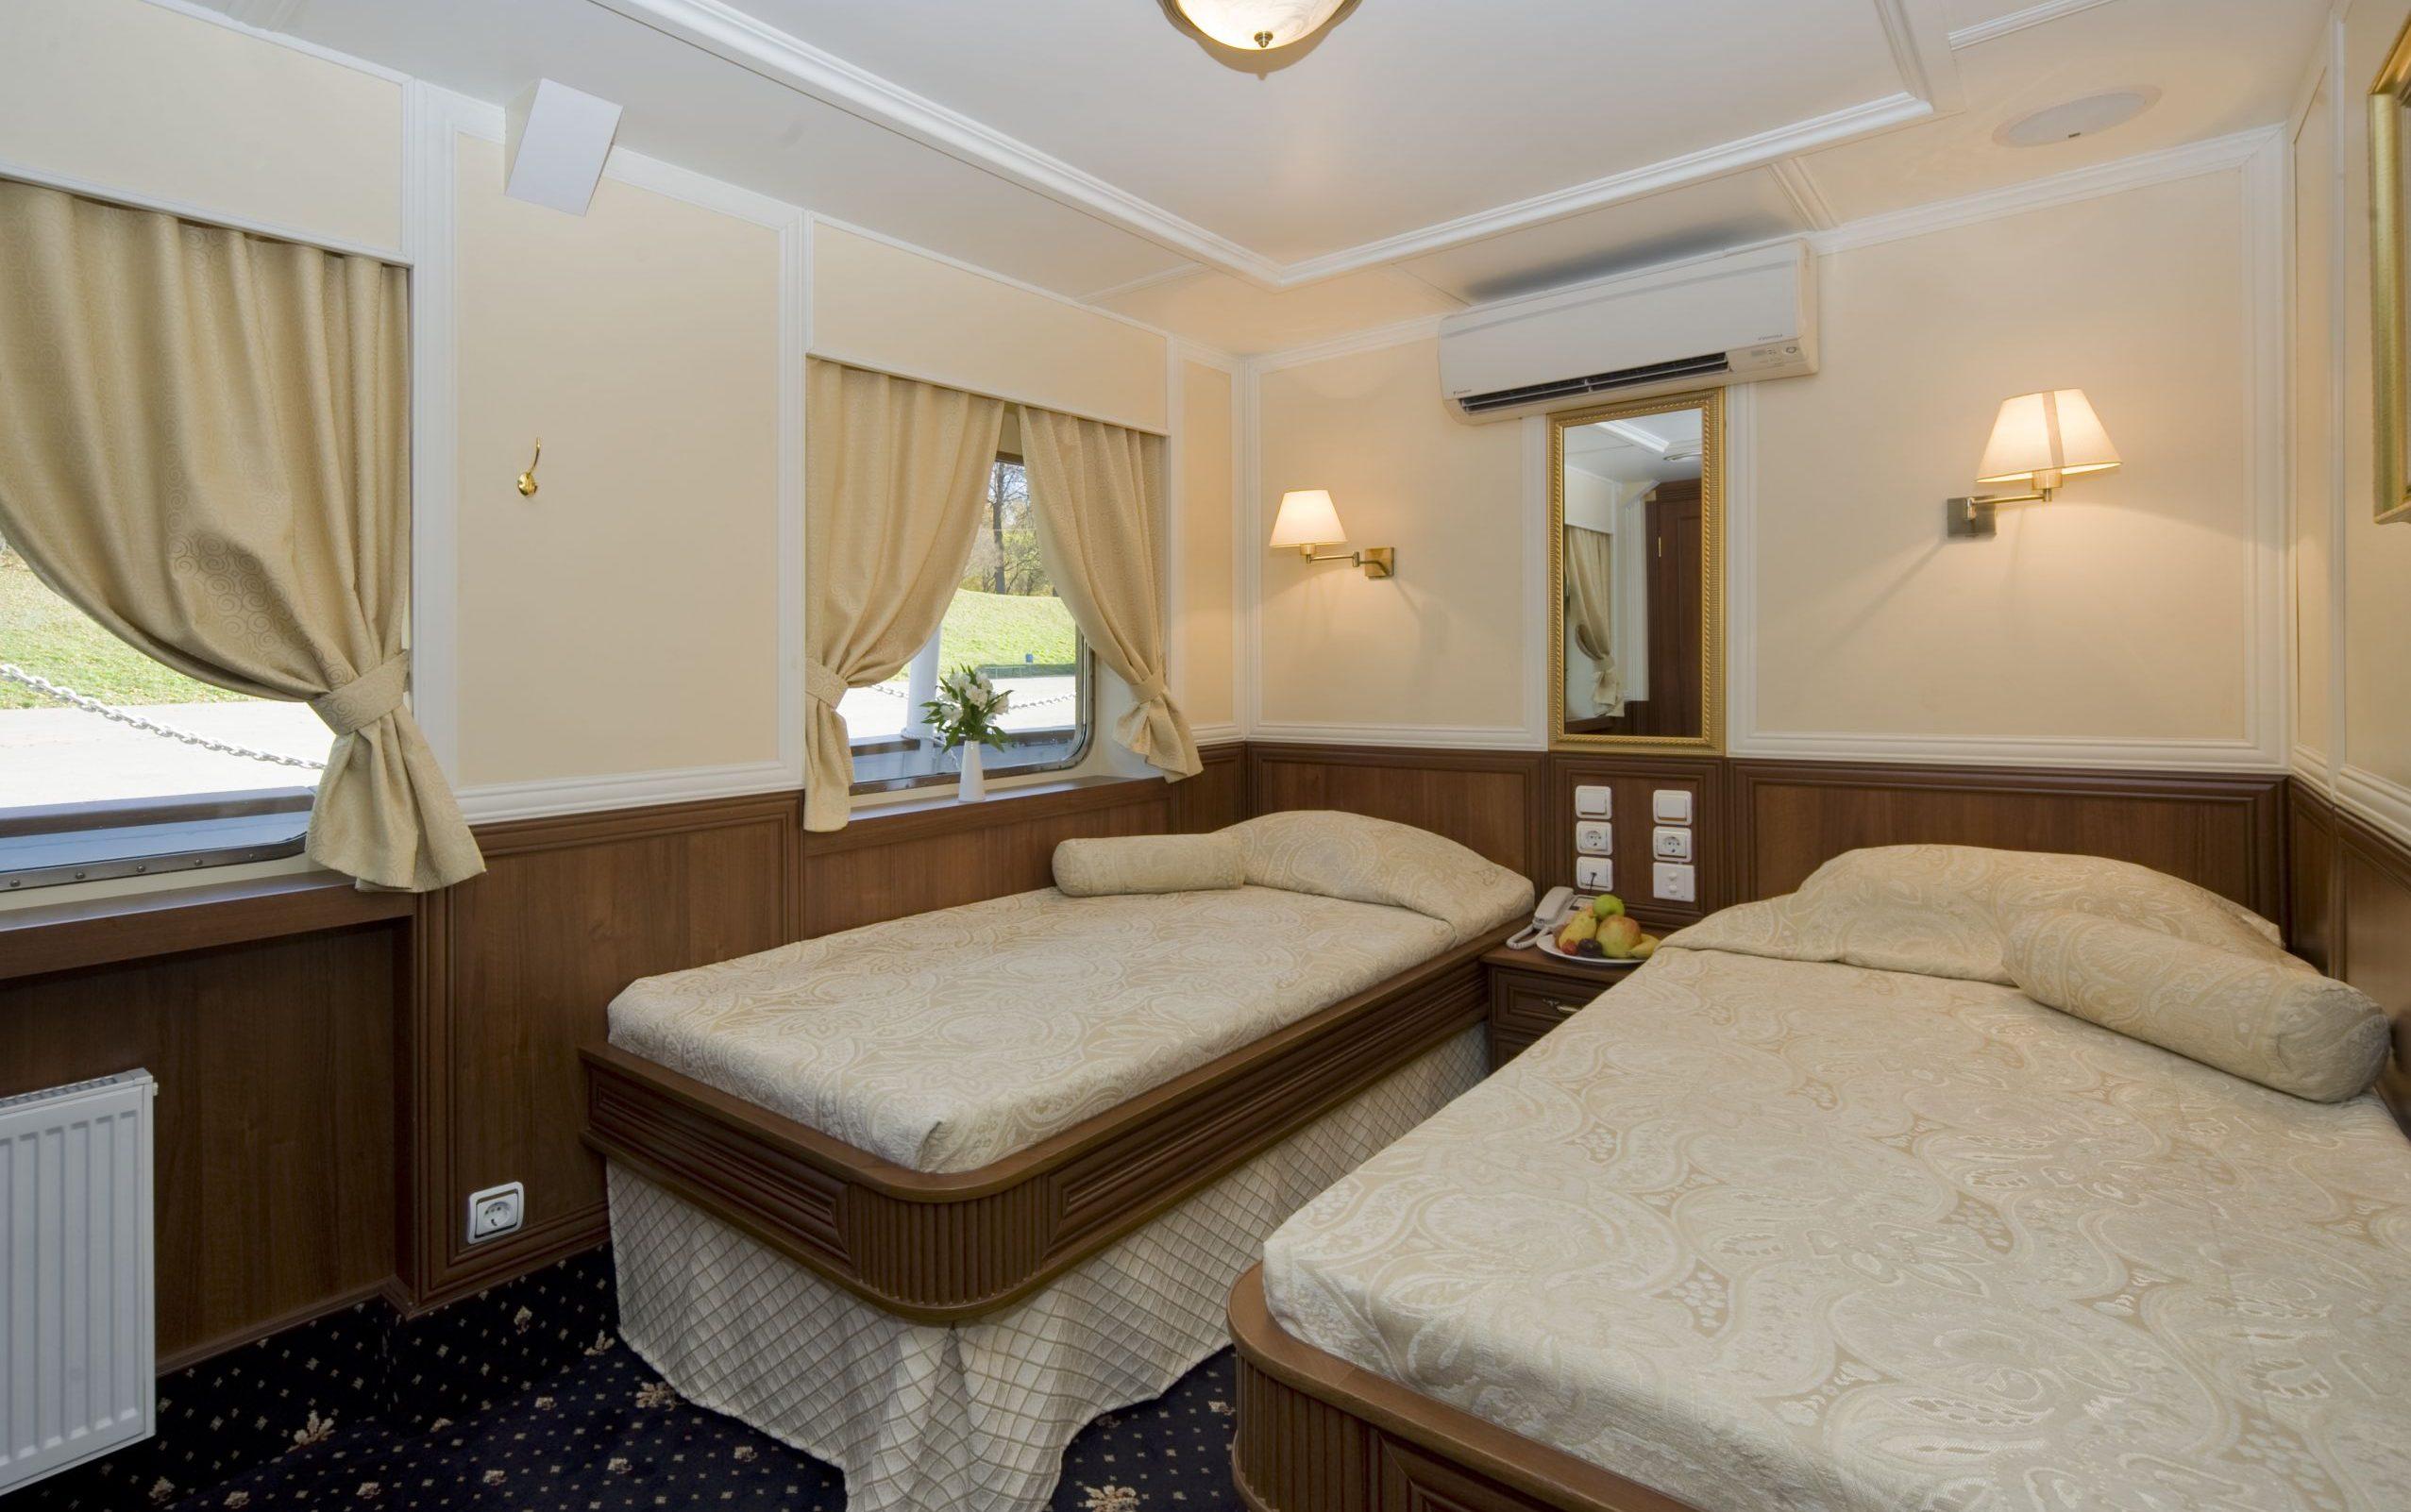 volga_dream_408_superior_stateroom_twin4